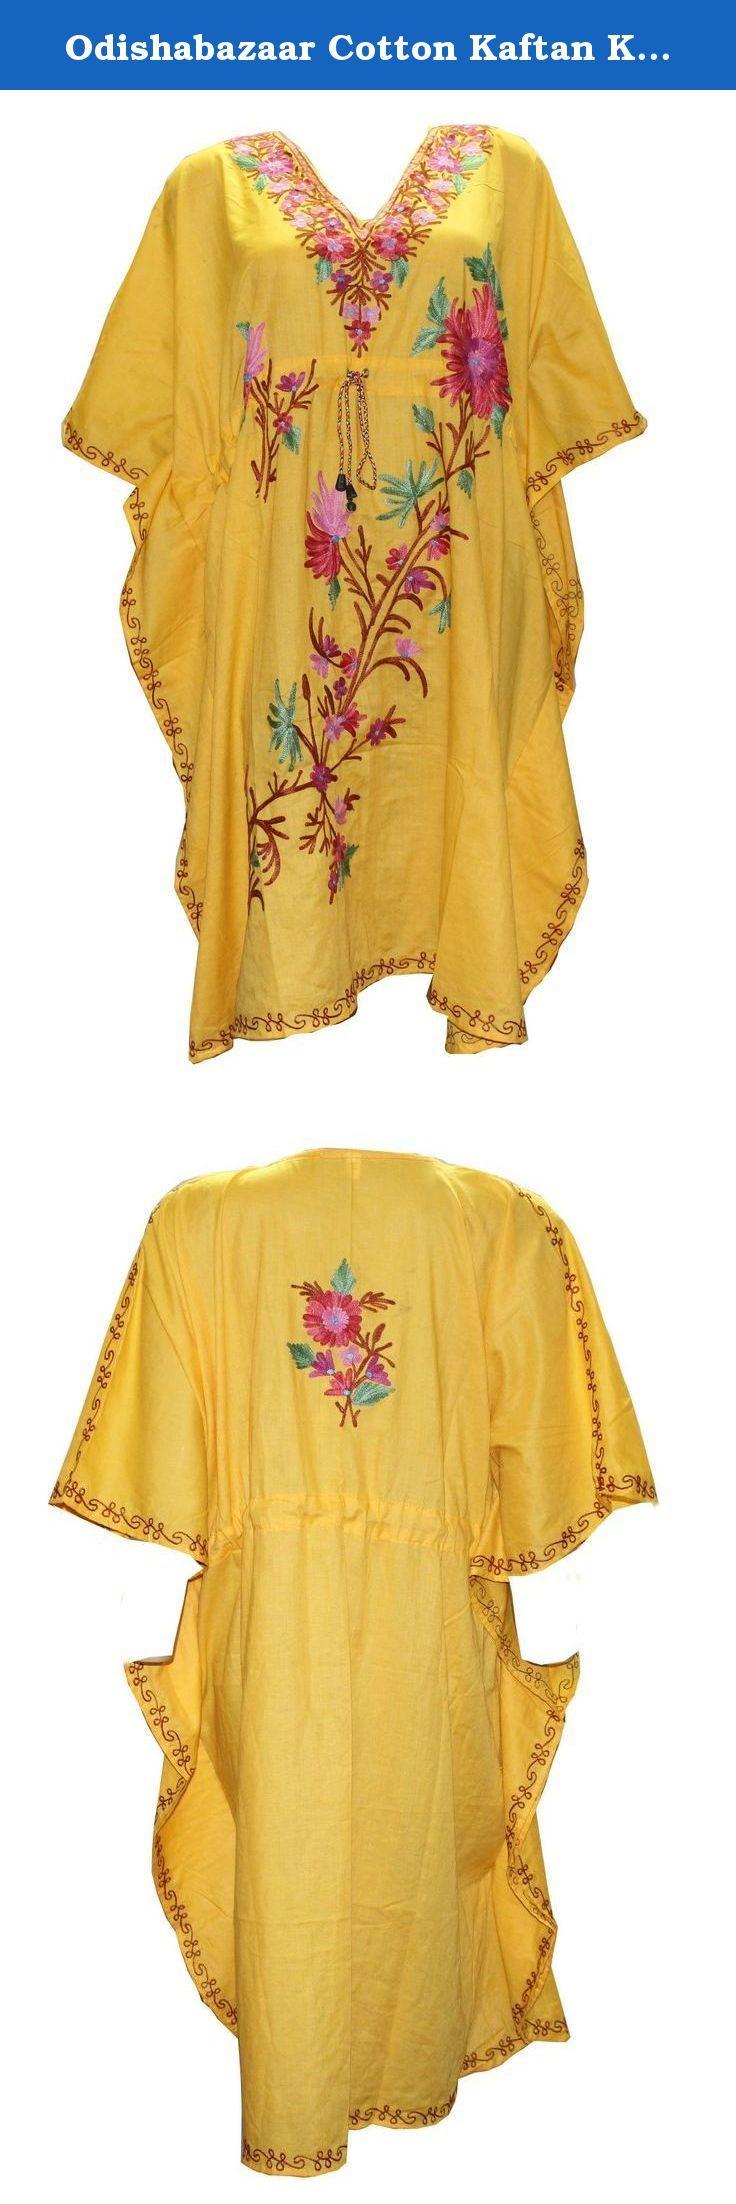 Odishabazaar Cotton Kaftan Kashmiri Embroidered Short Length Dress for Women (multi-5). Short length Kashmiri Kaftan/lounge wear/beach wear/ Sort dress with Ari Embroidered Flowers.